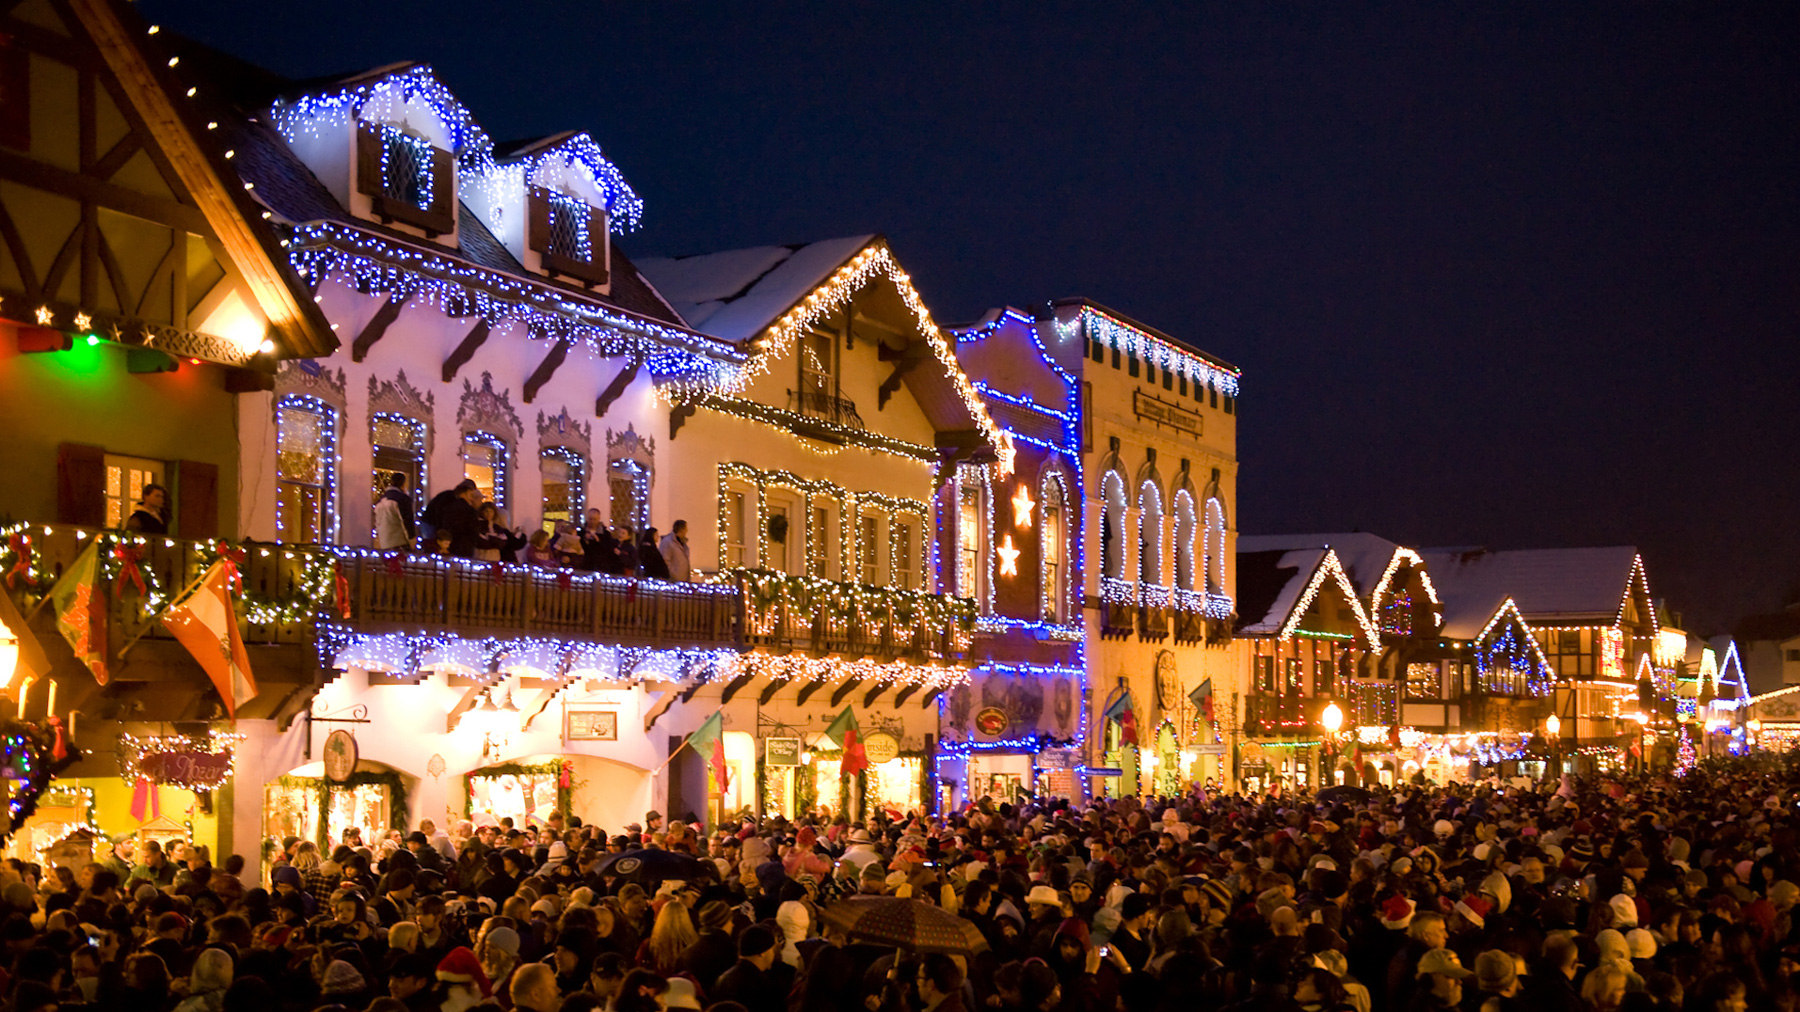 Leavenworth German Christmas Town Washington.Take A Virtual Drive Through The Most Christmas Y Town In